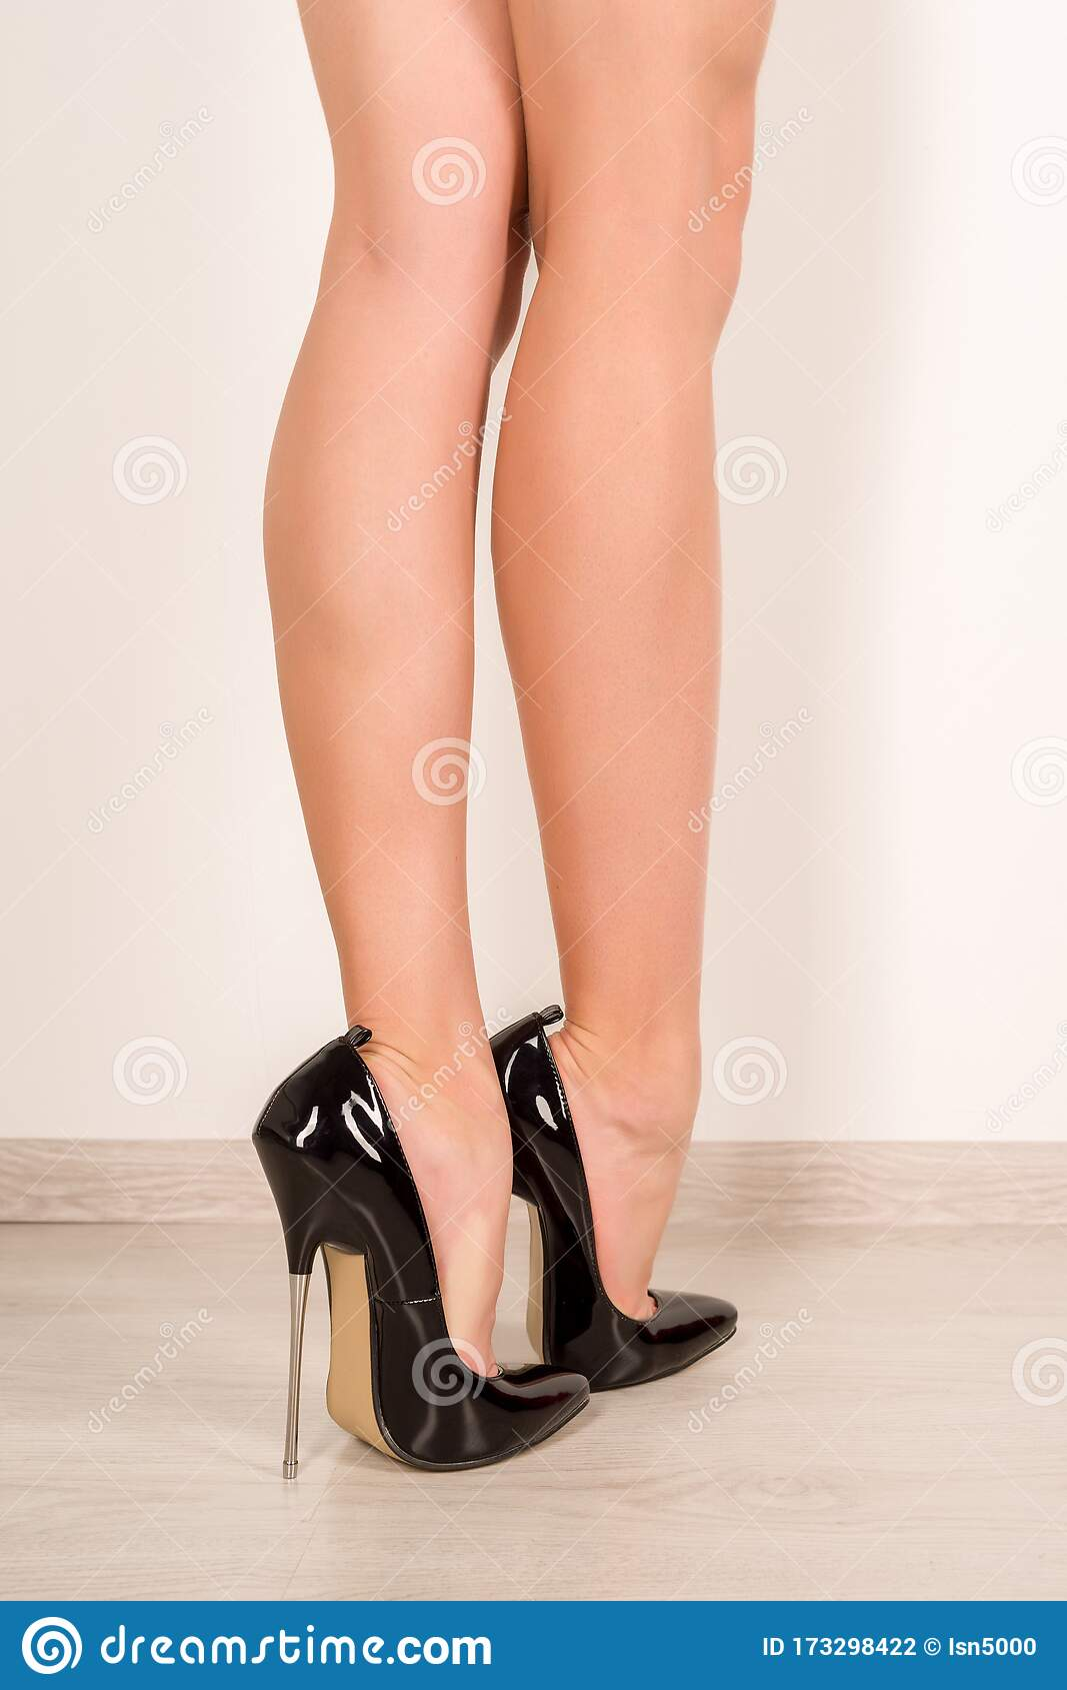 leather heels Fetish